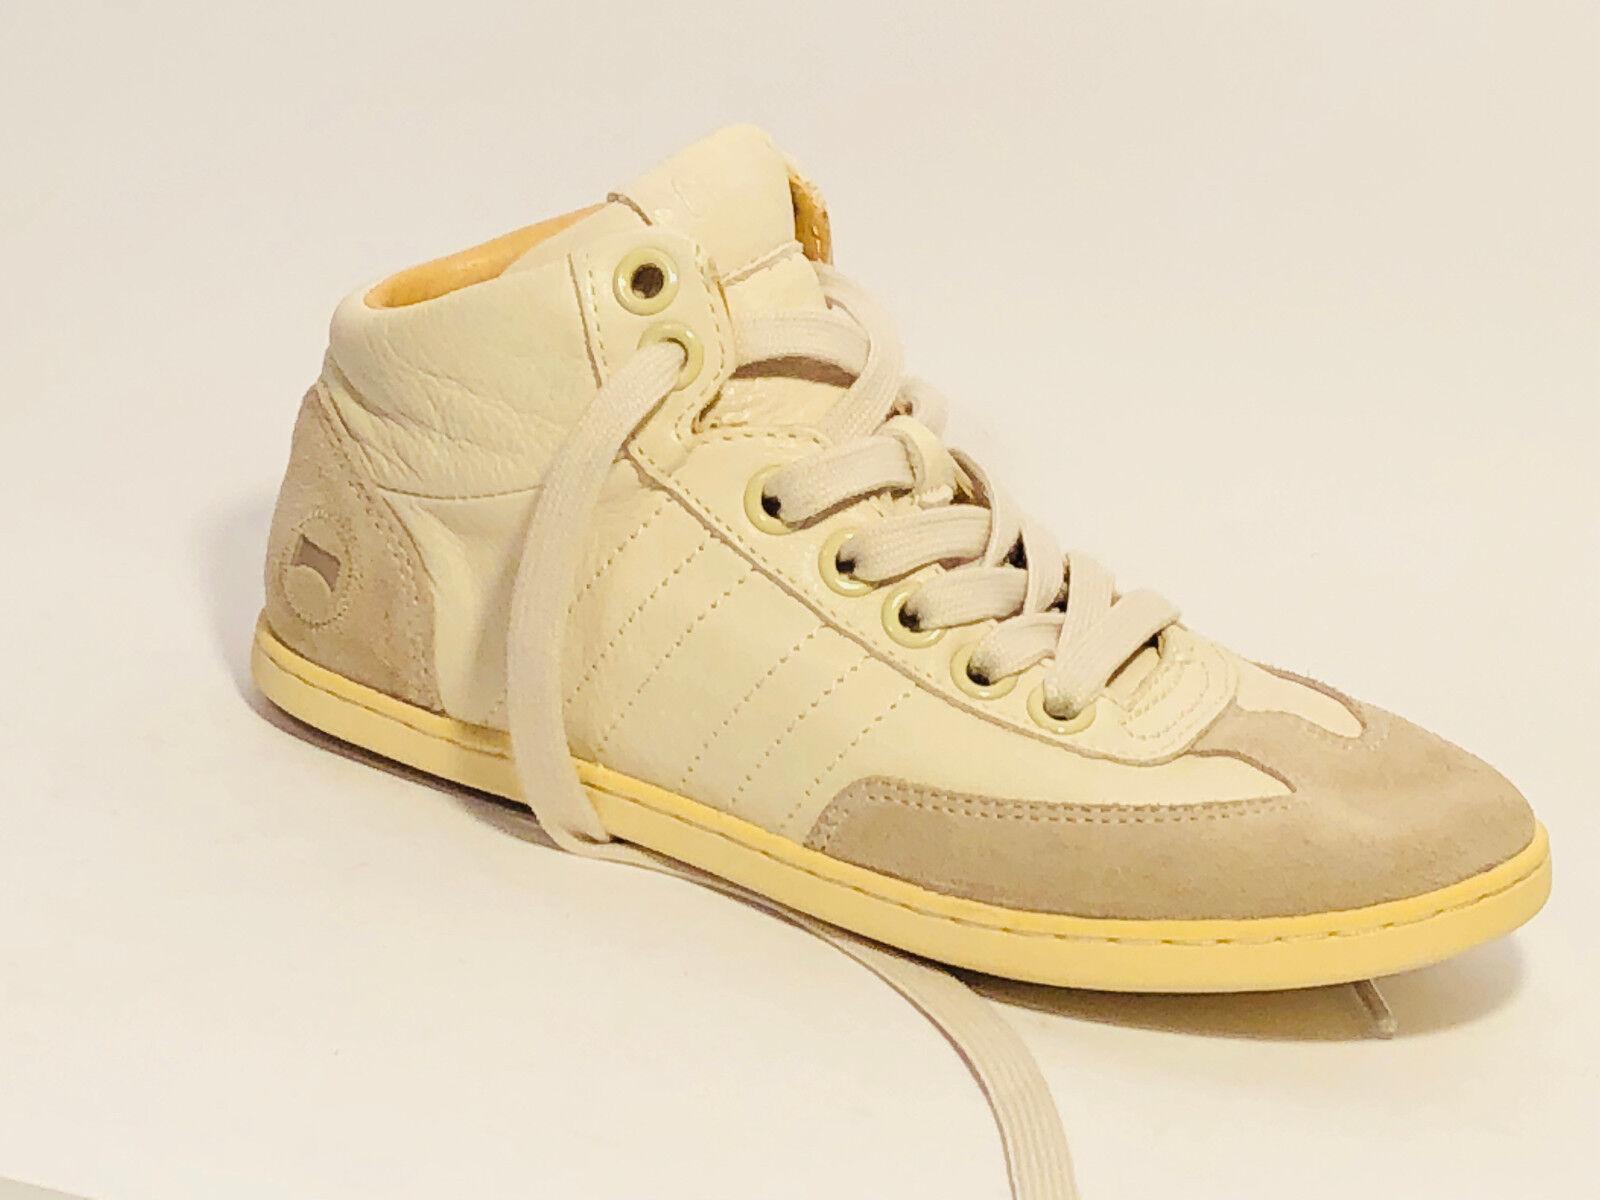 Camper Schuhe Stiefel Leder Sneaker Stiefel Schuhe Größe 36 (UK 3,5 ) Beige 43c6bc